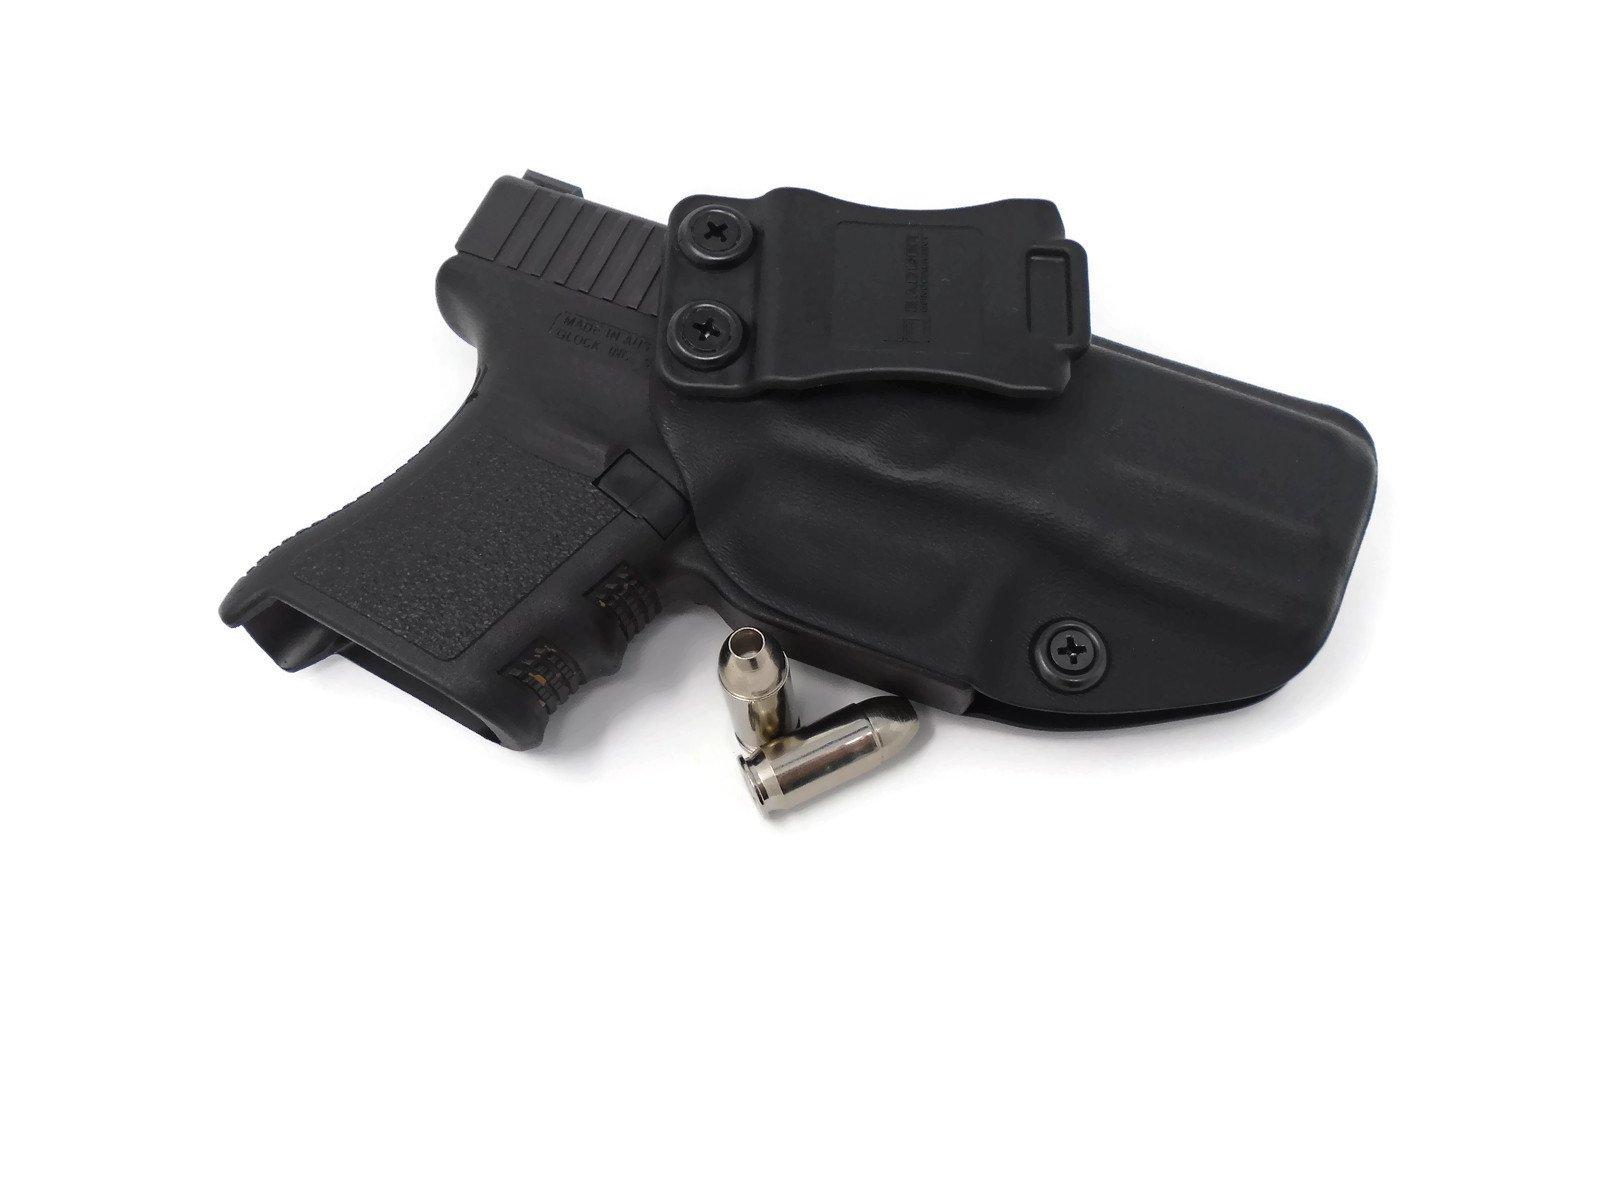 Badger Concealment Glock Holster RIGHT